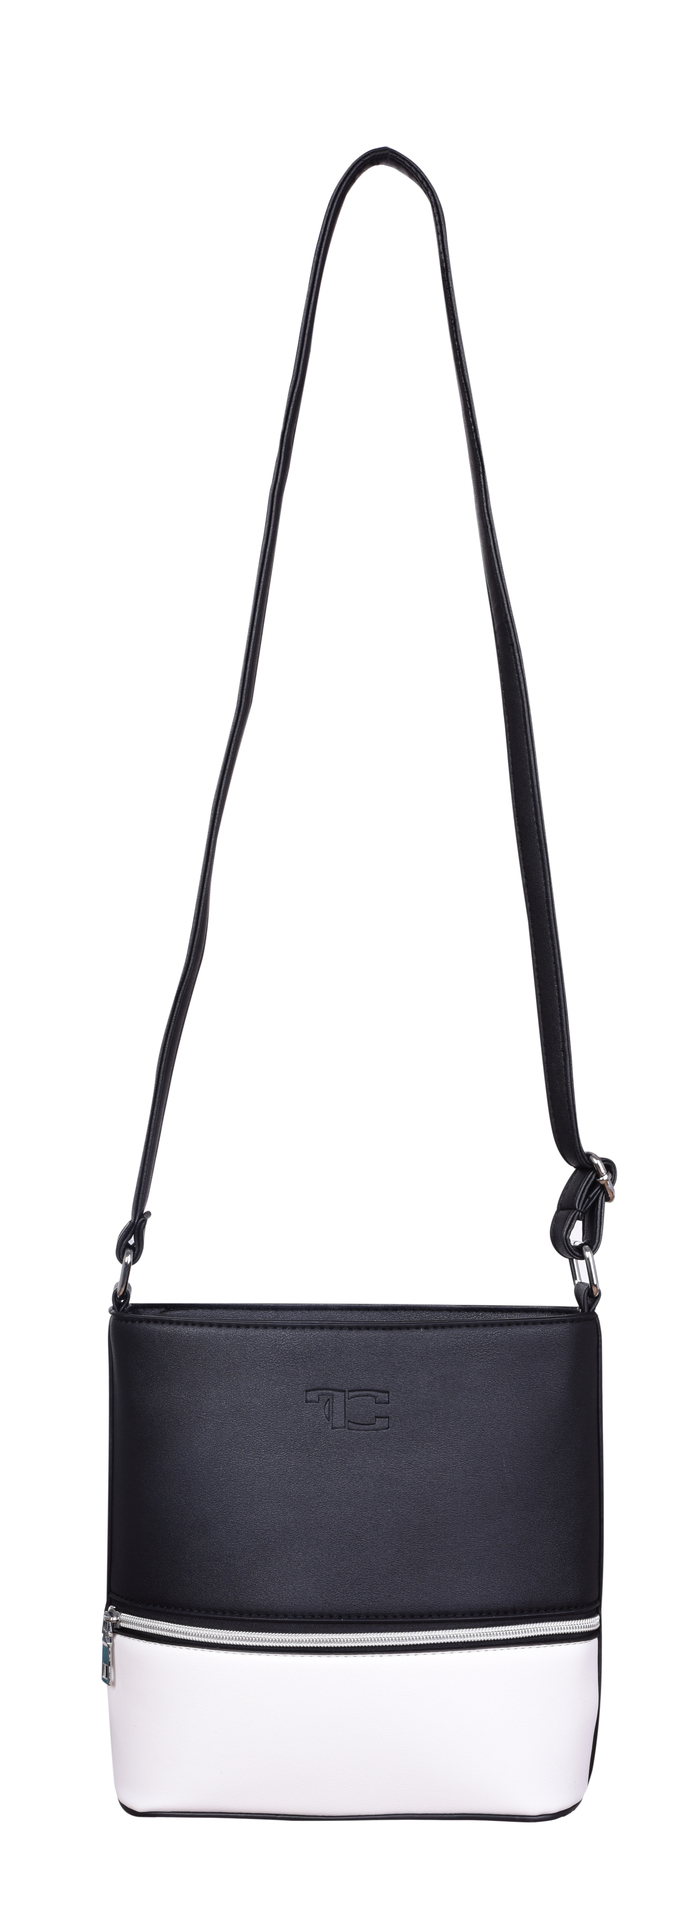 045a08e80c ... FC20032-INFINITY Crossbody kabelka z ekokože čierno biela ...